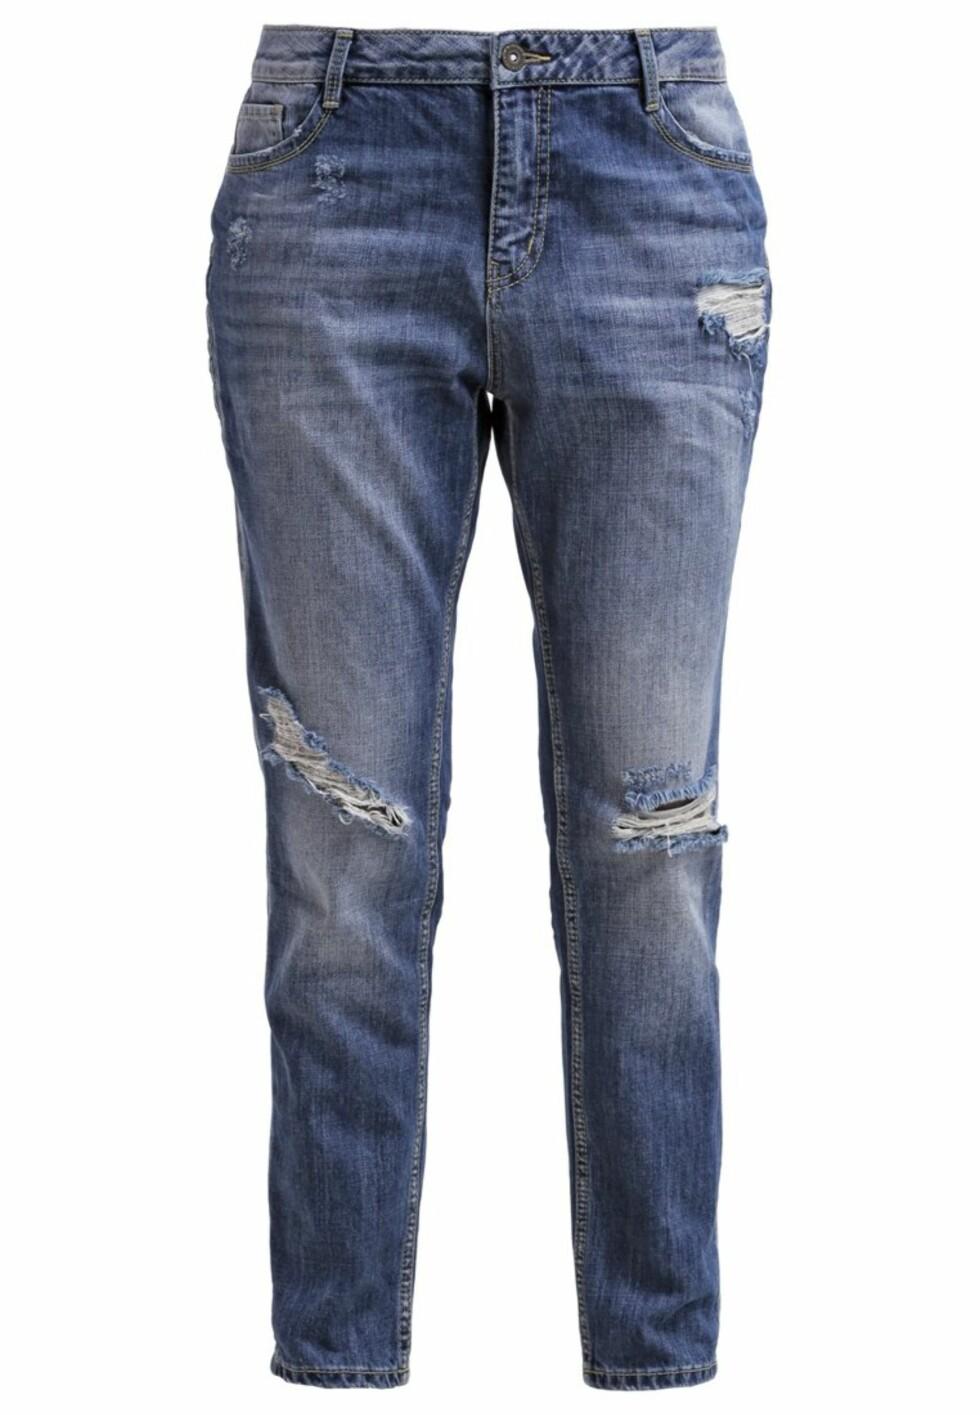 Jeans fra Tom Tailor Denim via Zalando.no, før kr 749 - nå kr 559. Foto: Zalando.no